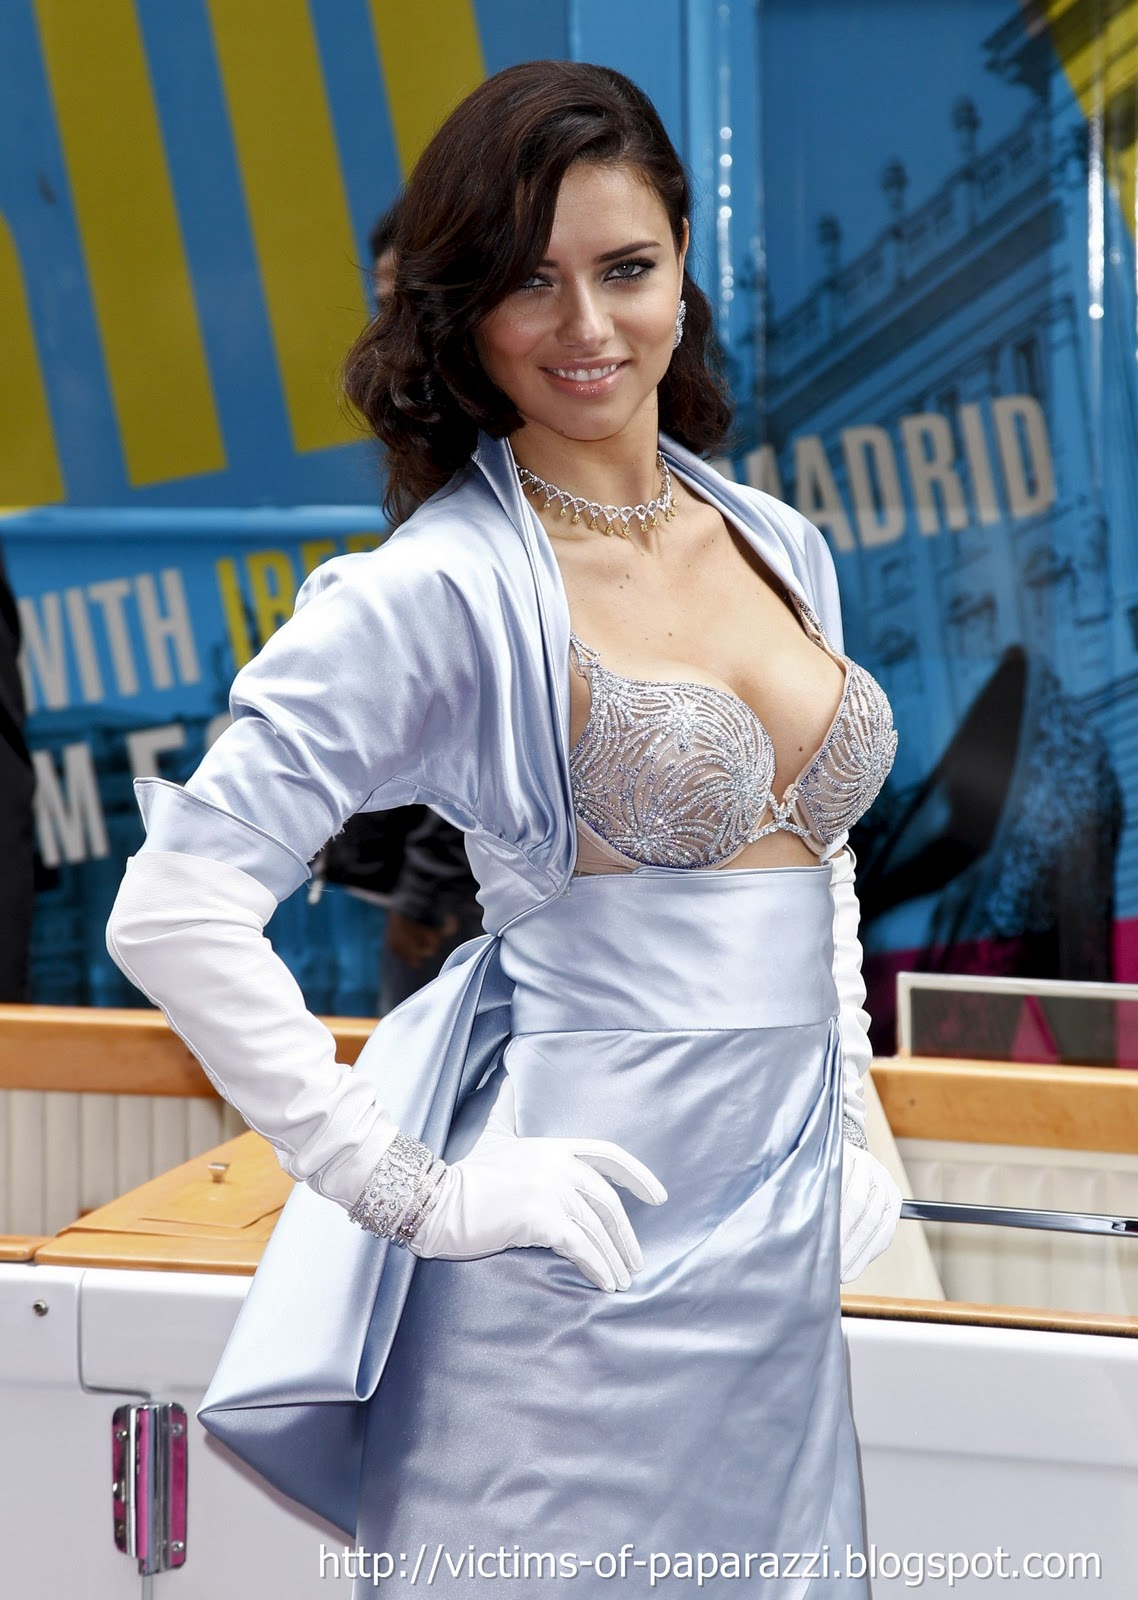 http://1.bp.blogspot.com/_NFcDSk31Yq8/TM-VzbFgmhI/AAAAAAAAATc/8q_vdgNLKmc/s1600/Adriana+Lima+bra+1.jpg